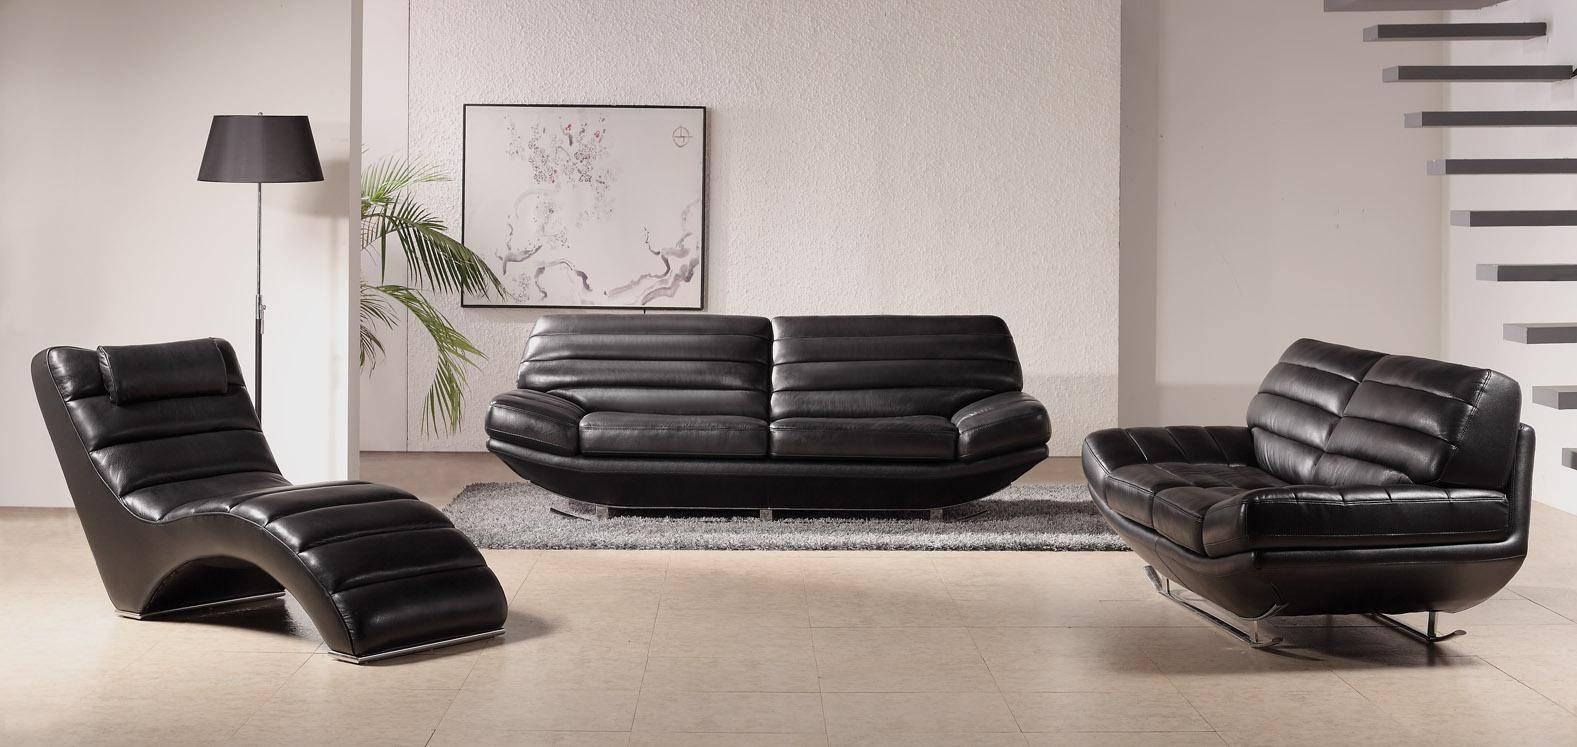 19 Contemporary Leather Sofa Set | Carehouse Intended For Contemporary Black Leather Sofas (View 1 of 30)